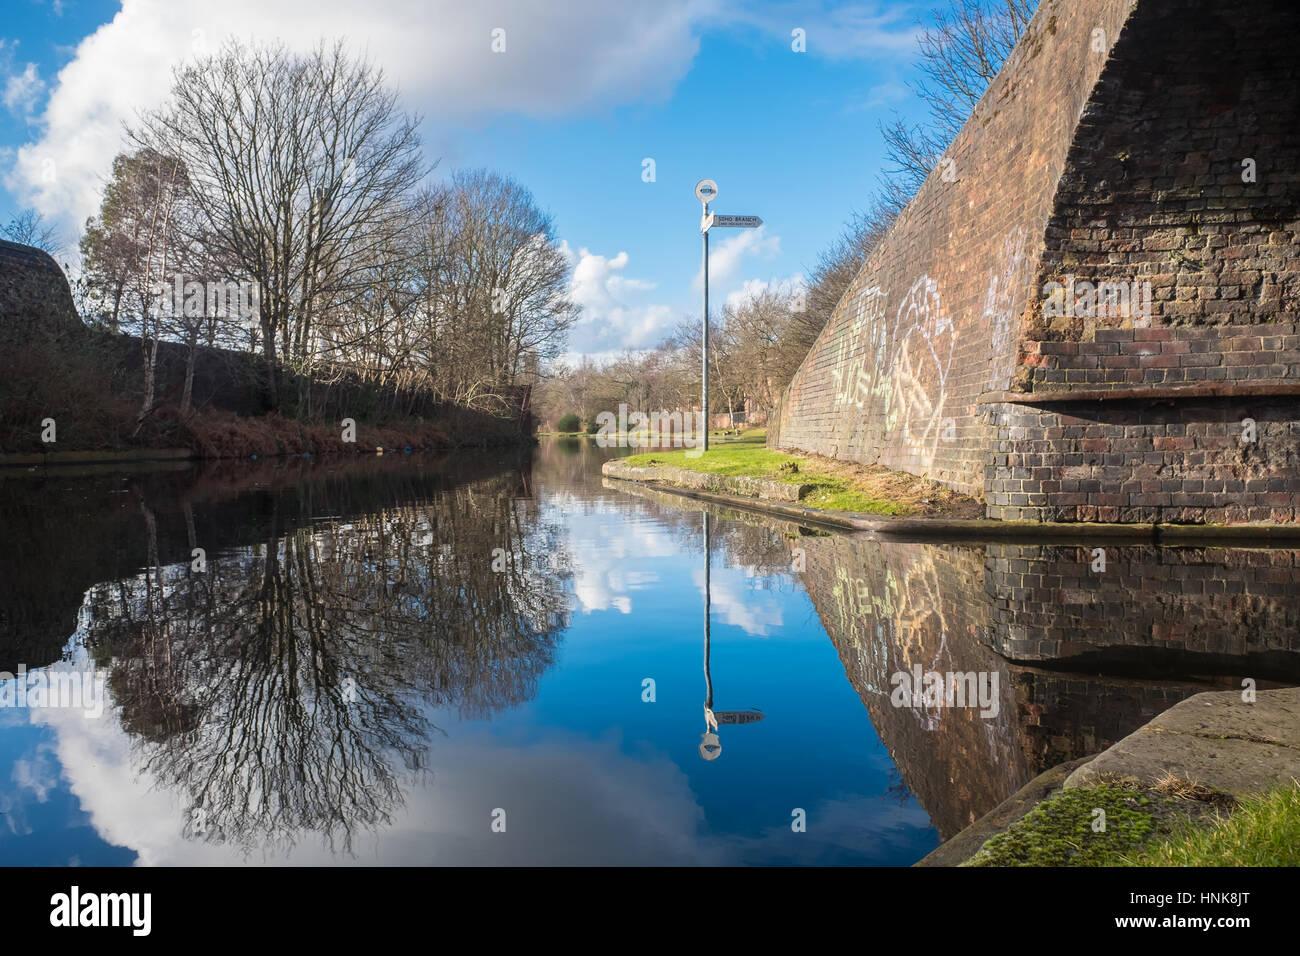 Blick auf den schönen Birmingham Kanal Stockbild